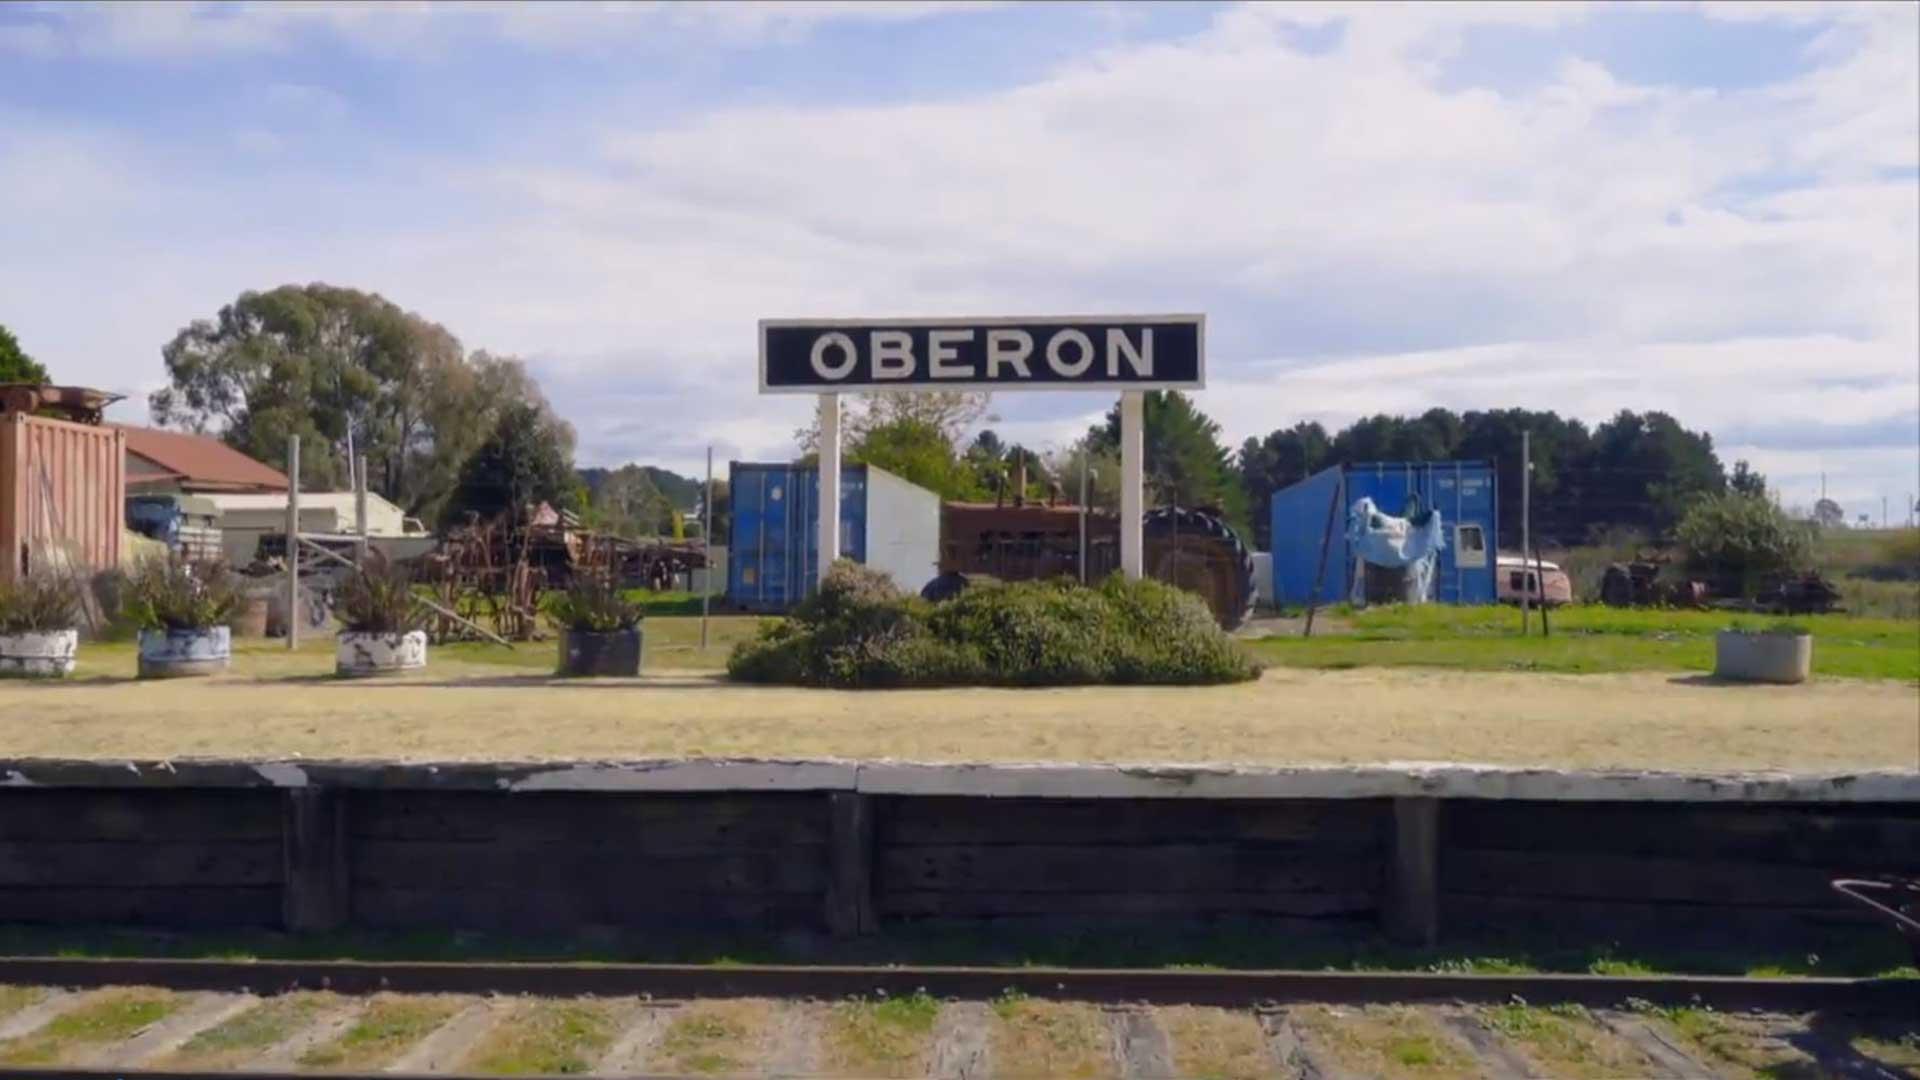 Oberon Train Station | Visit Oberon